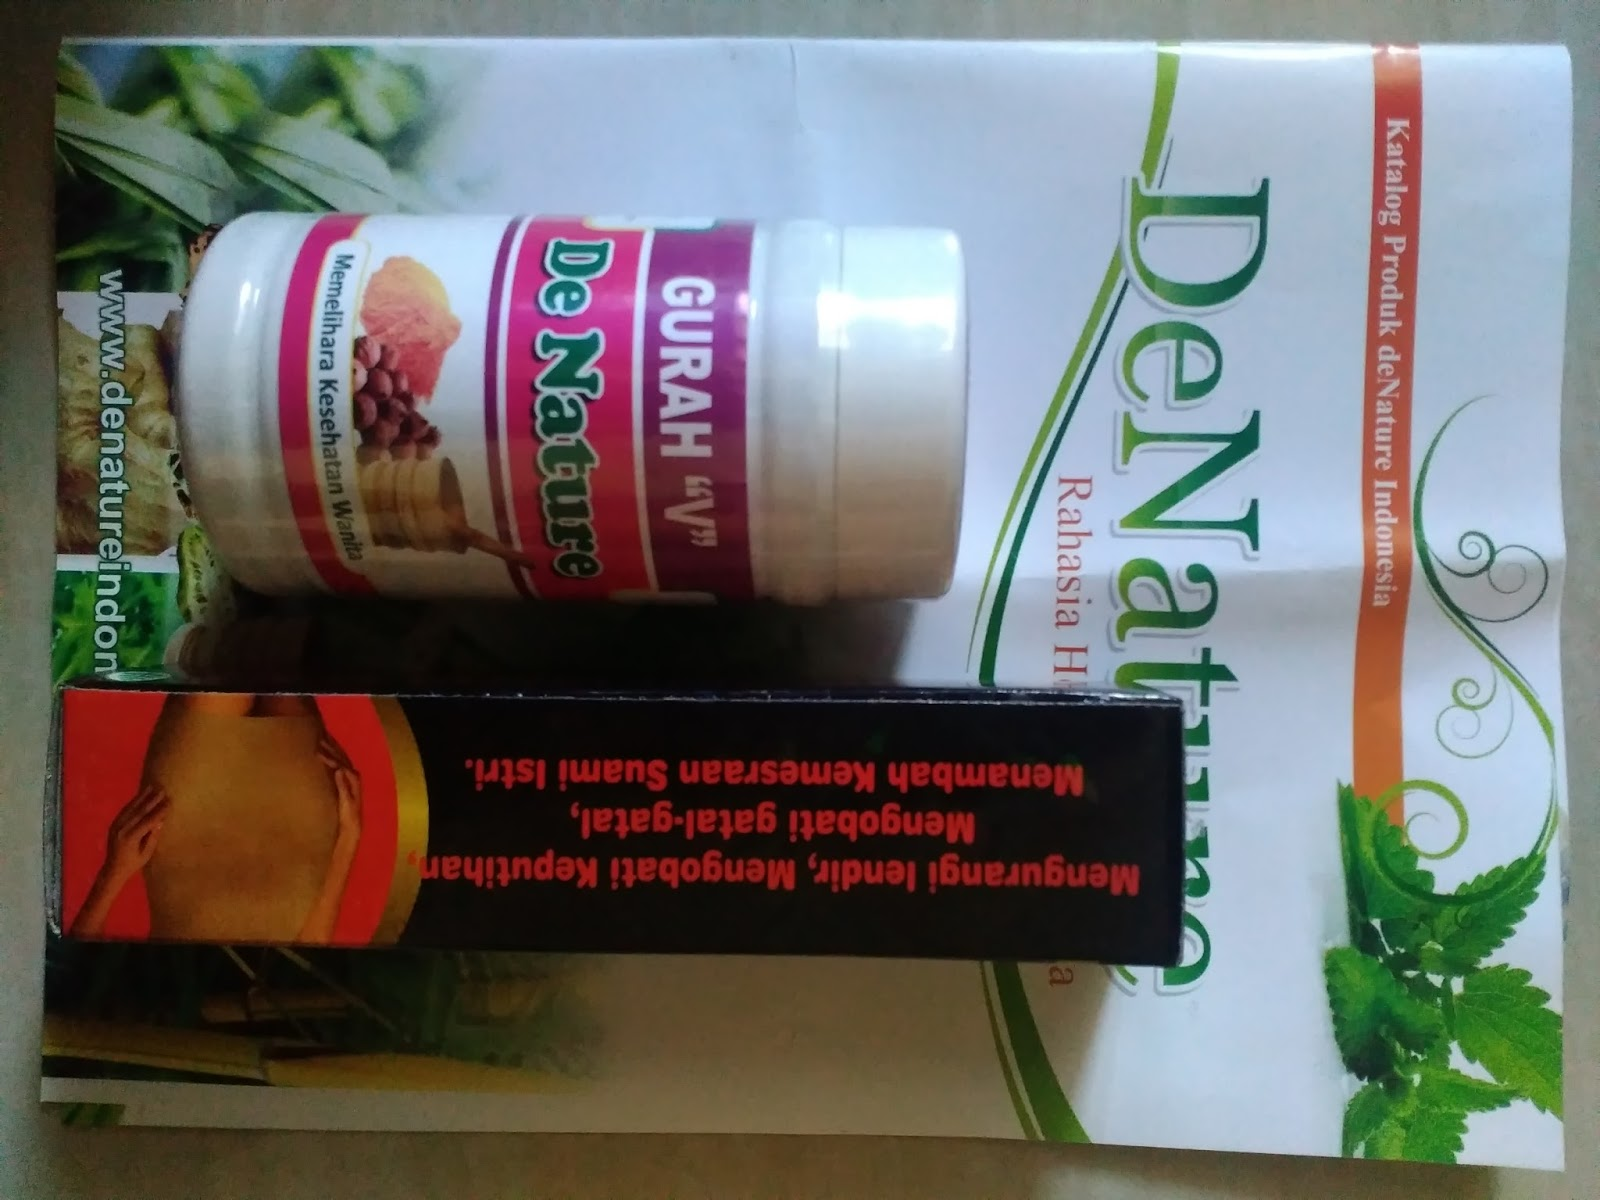 obat herbal keputihan bau